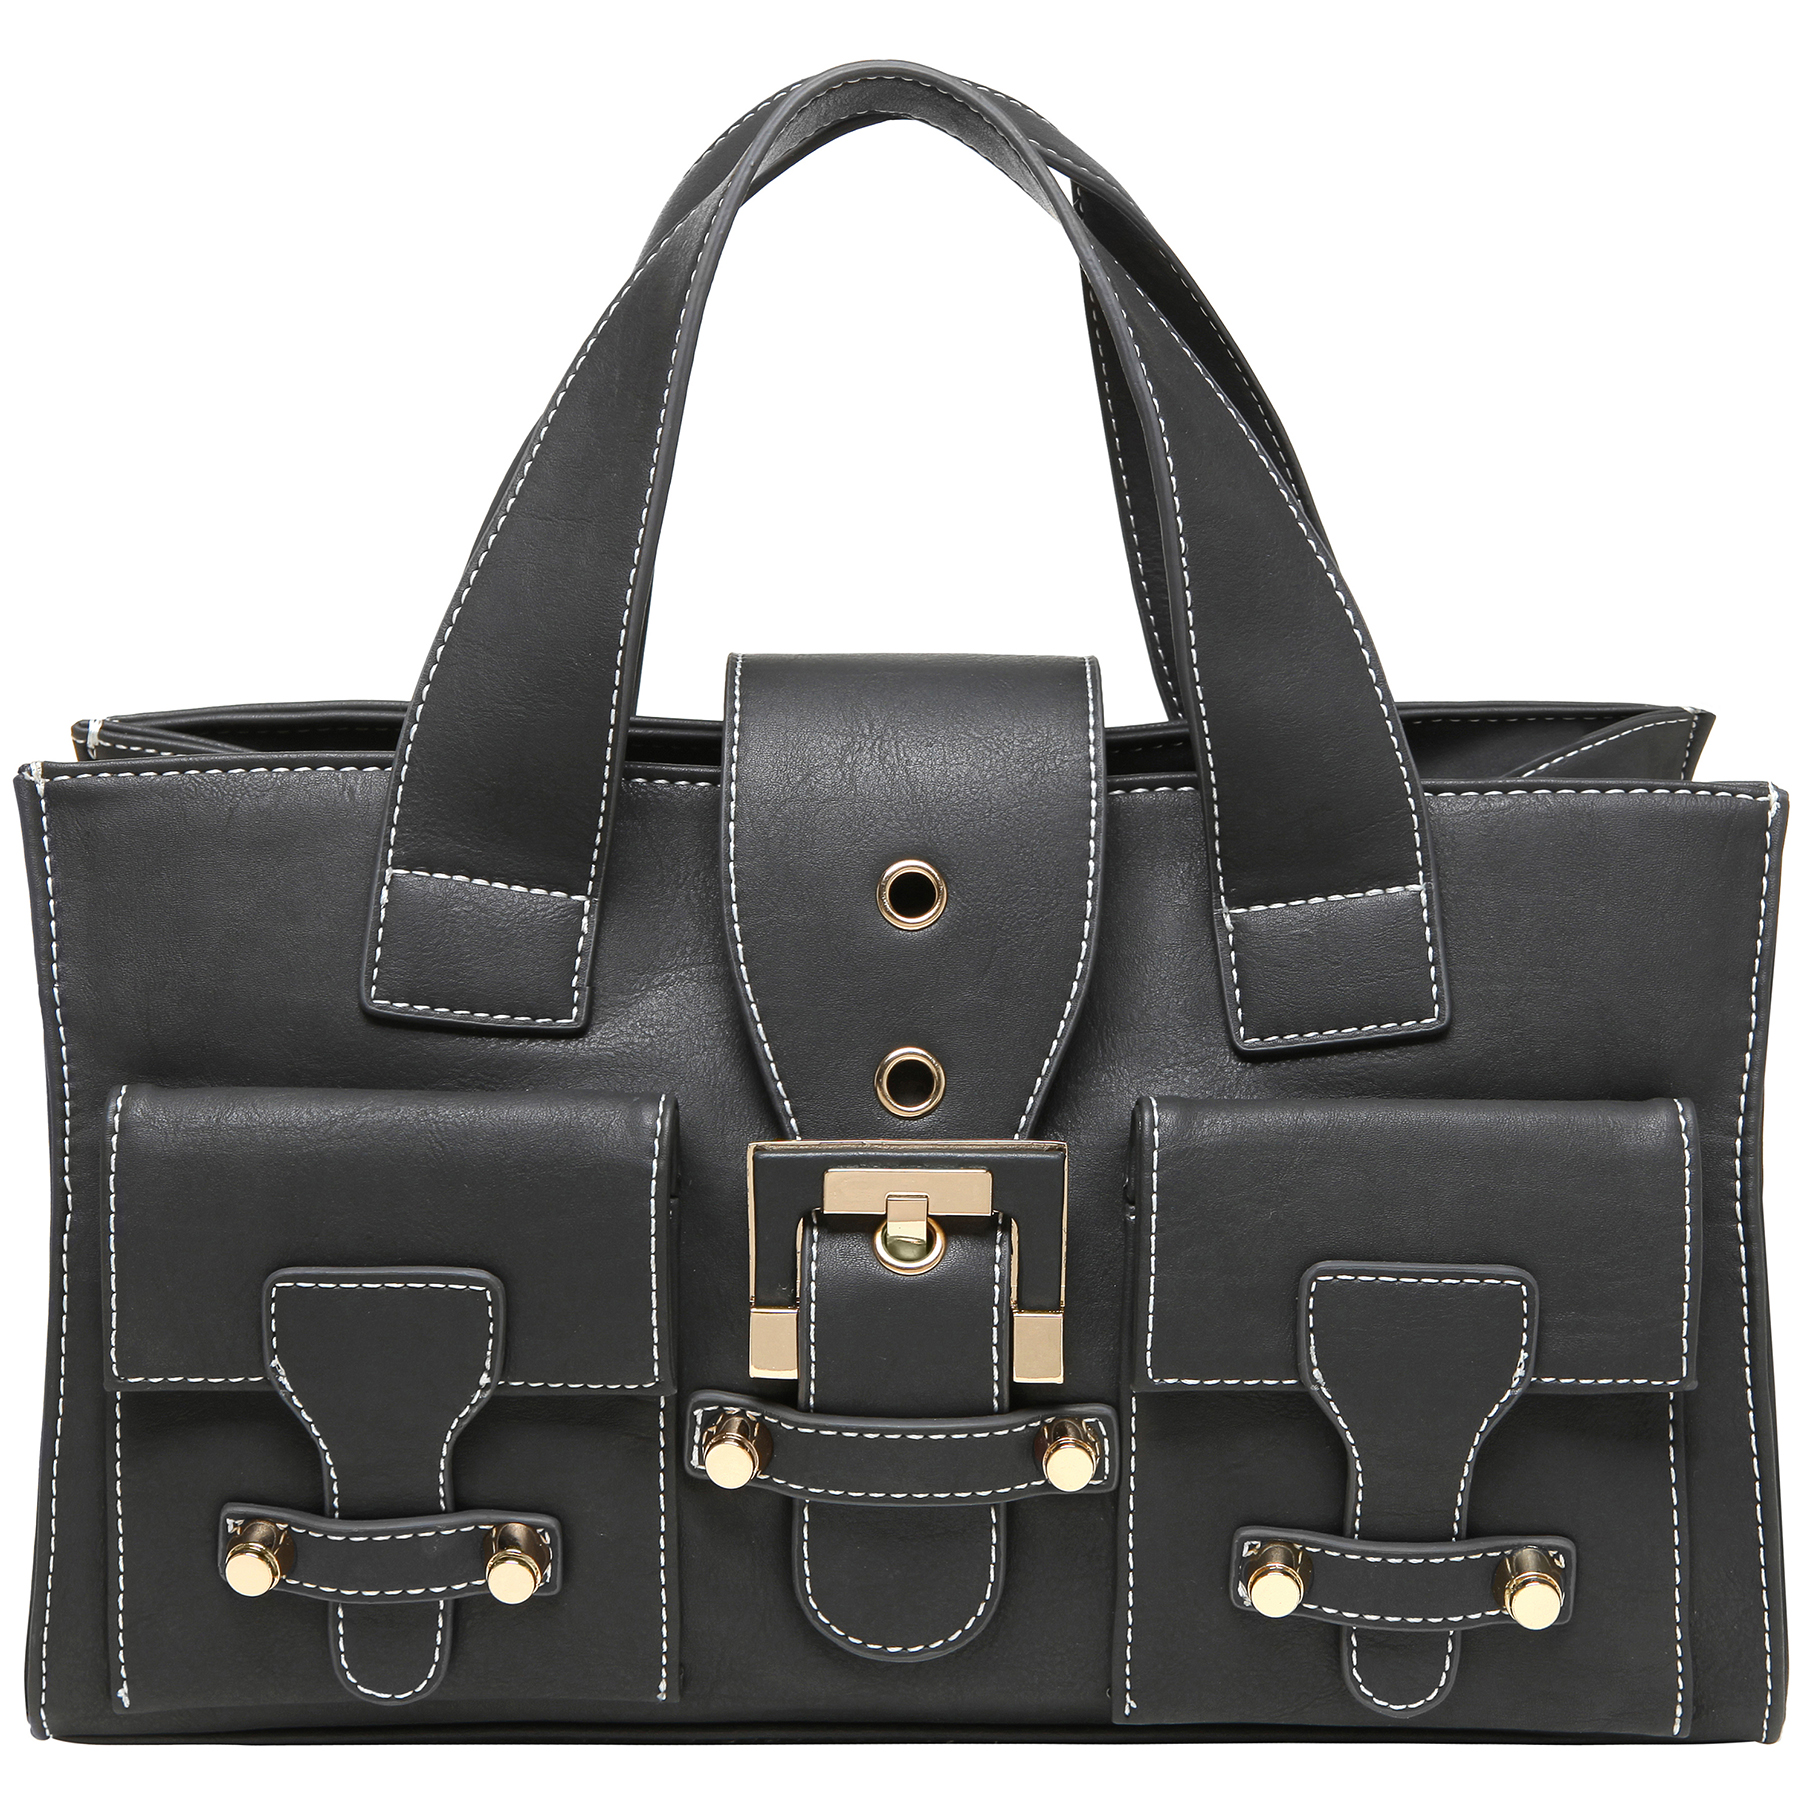 Anna Onyx Black satchel style womens designer handbag front image